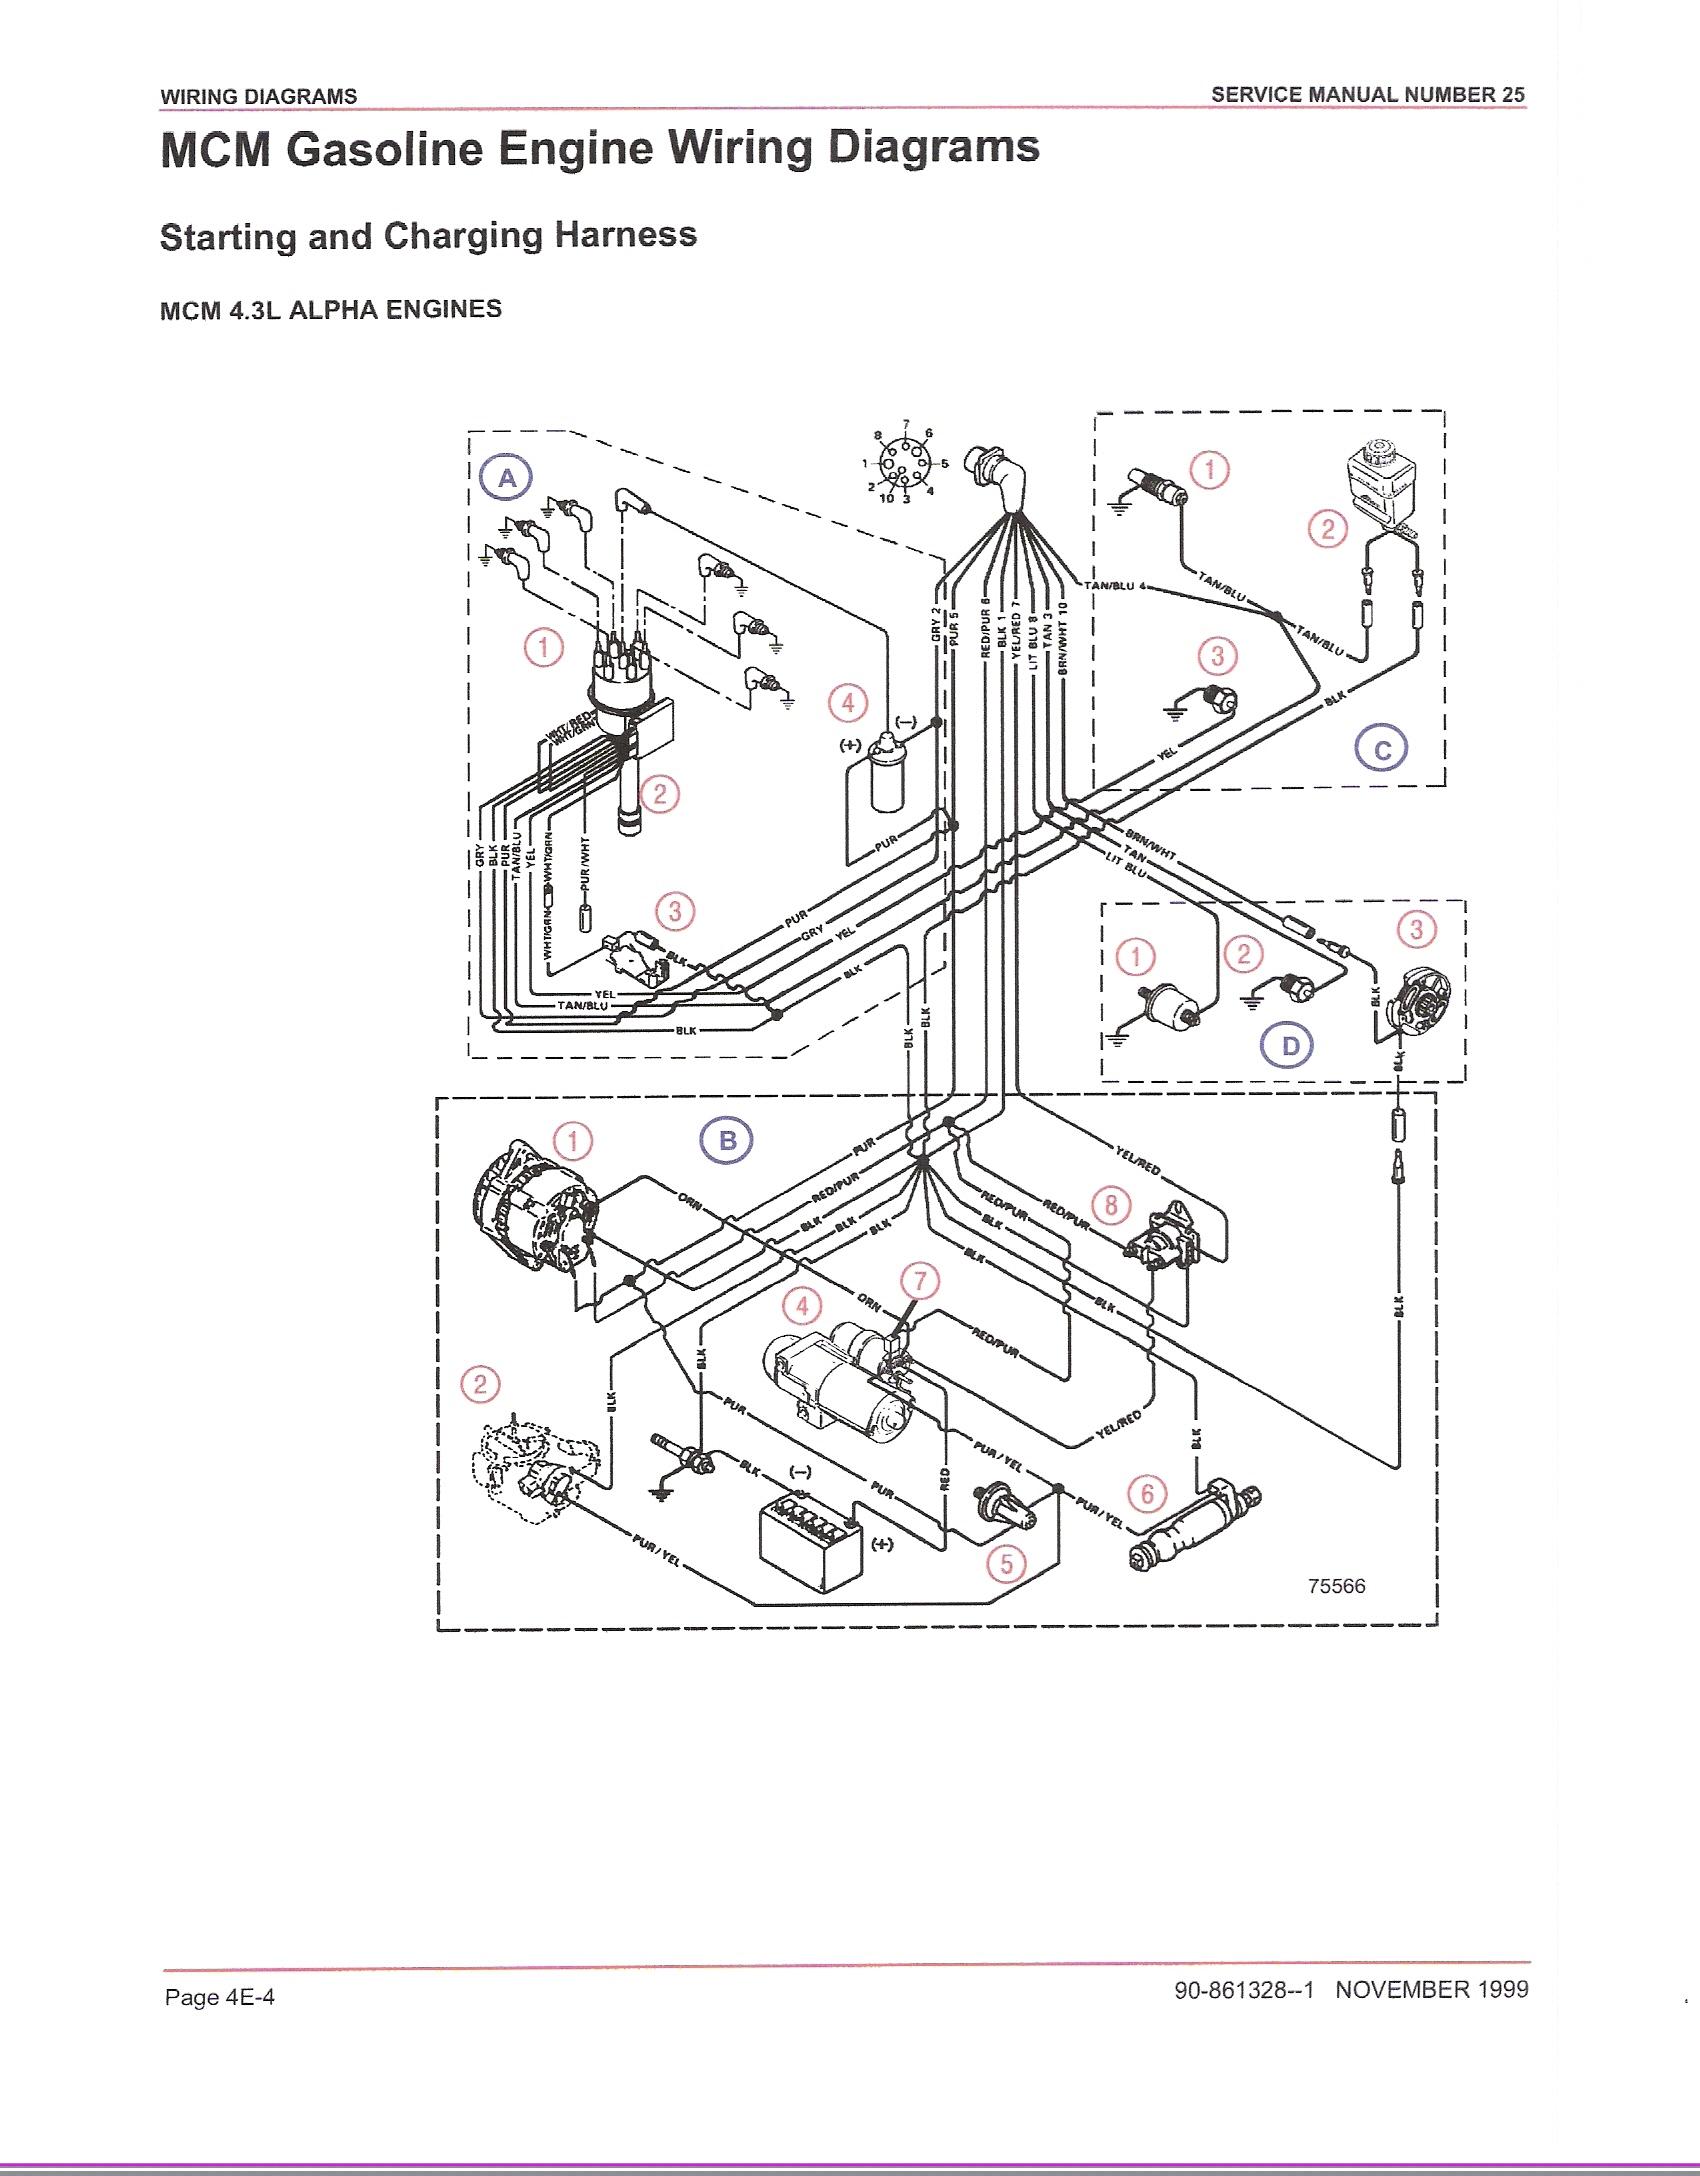 mercruiser 3.0 alternator wiring diagram